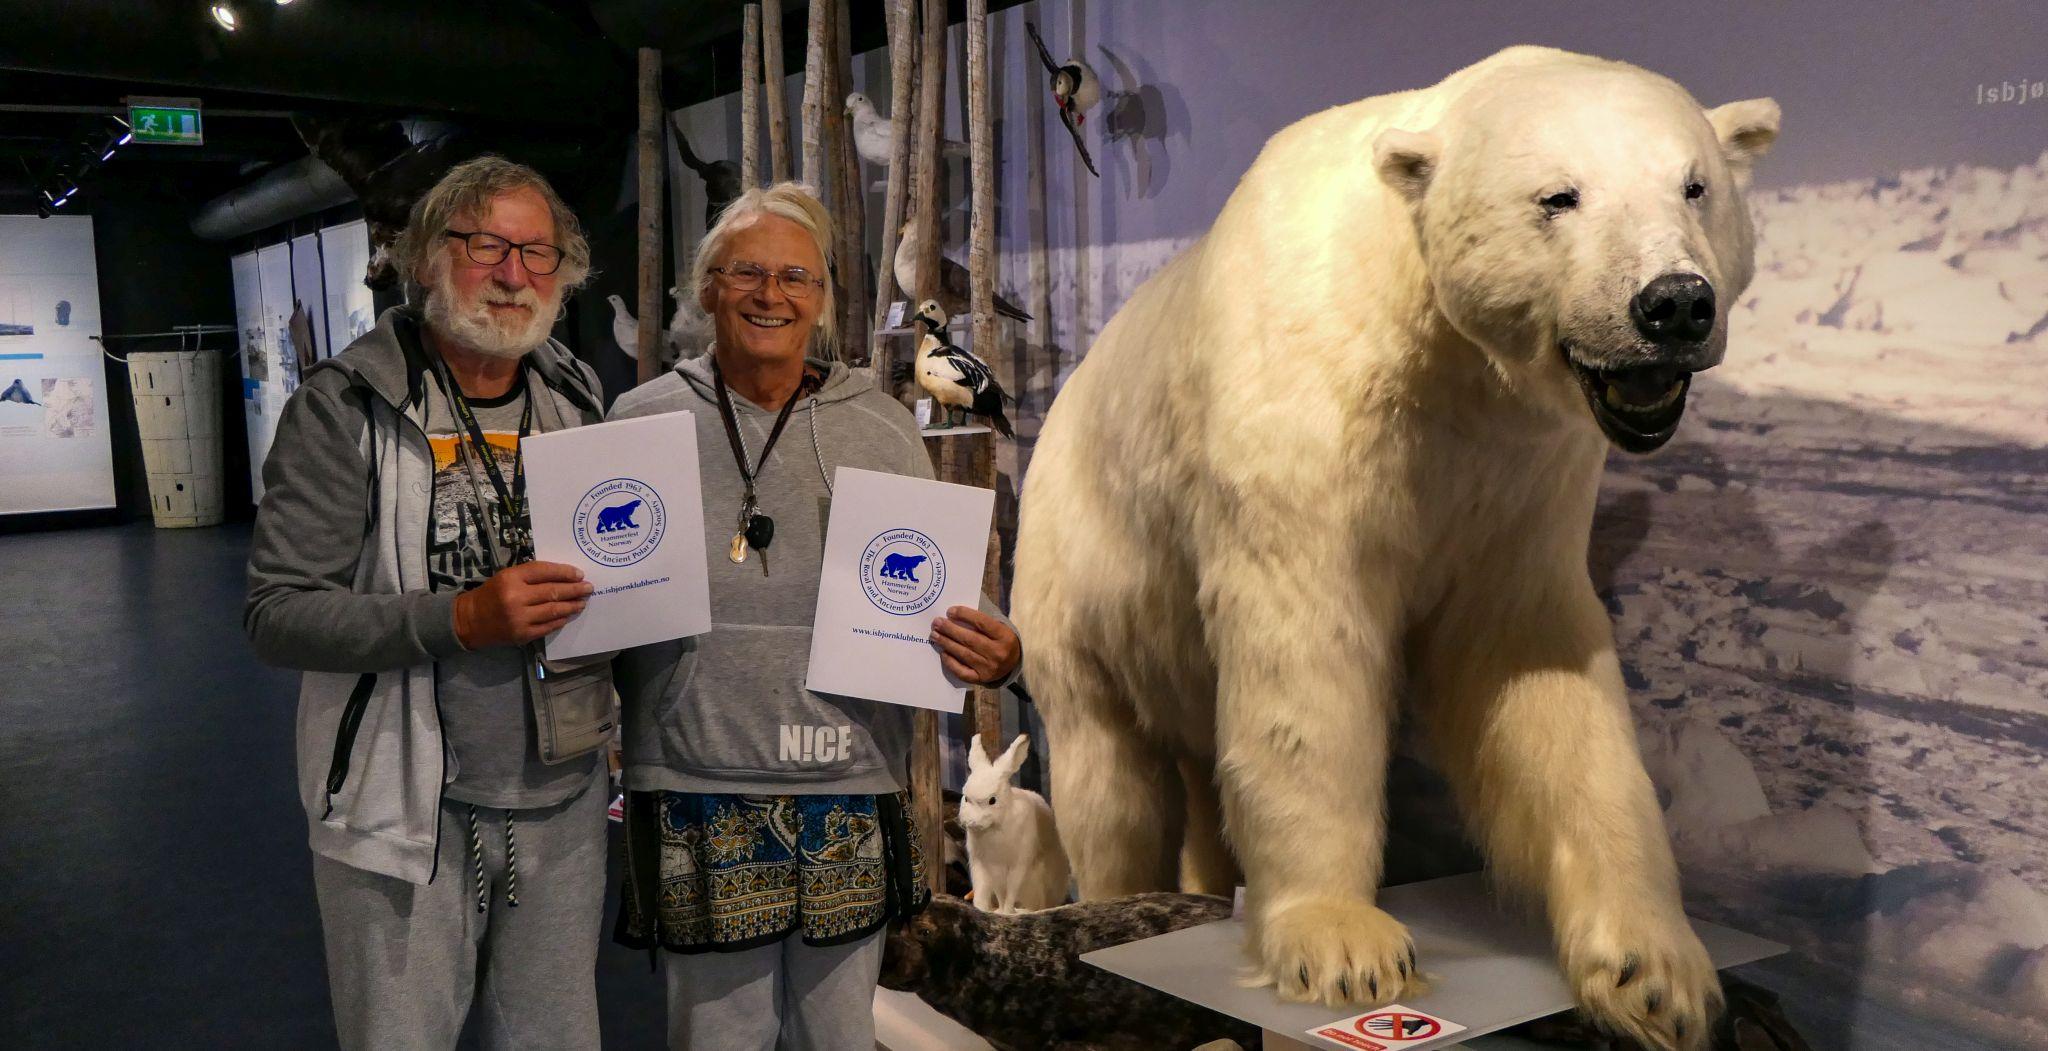 Reisebericht Nordkap und Hammerfest